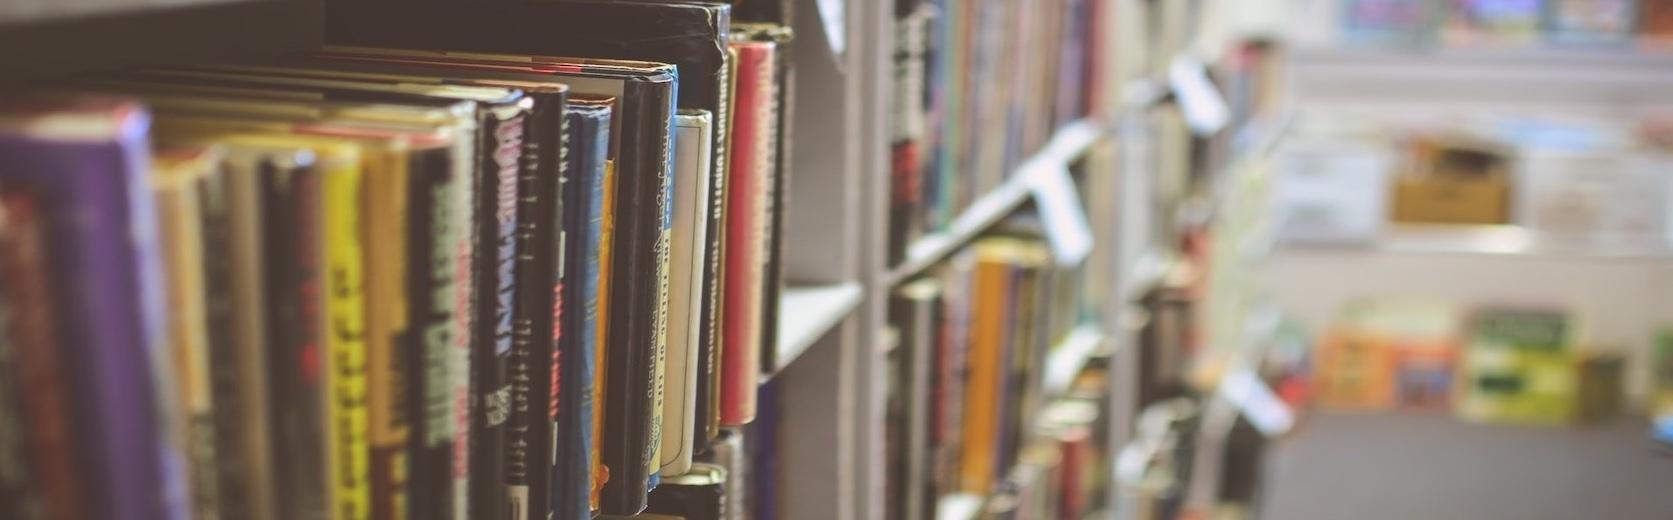 Biblioteca Comunale 'Carlo di Bartolomeo' di Tocco da Casauria